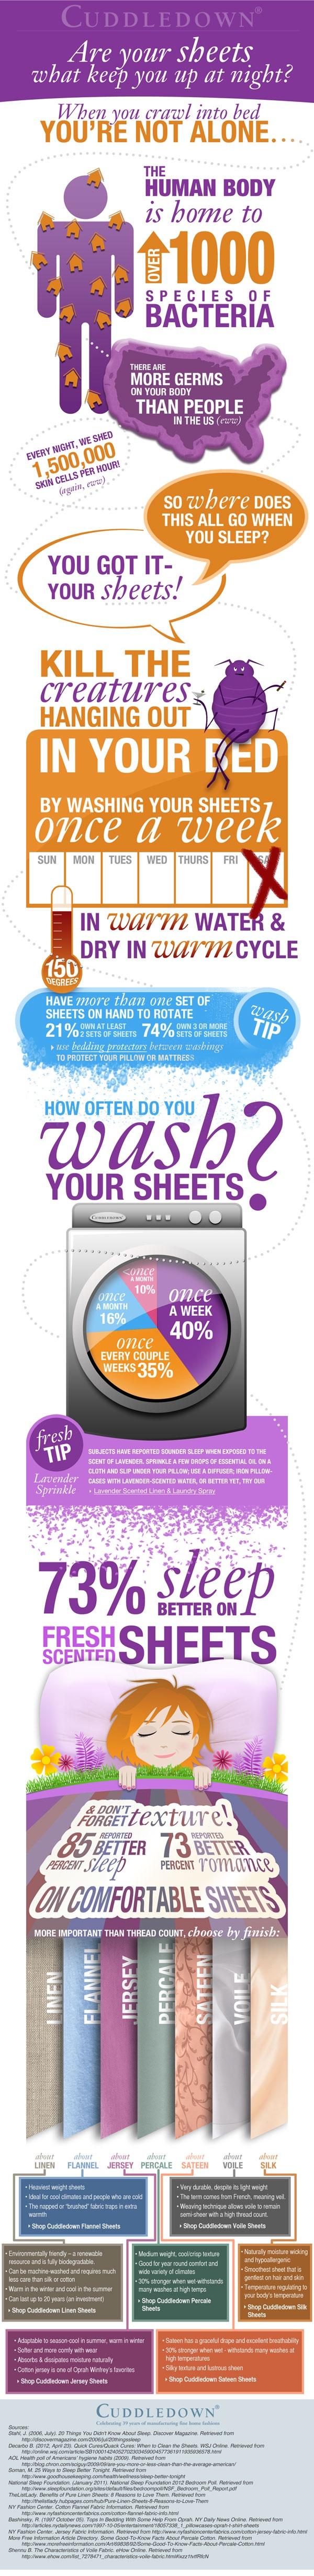 Fresh on IGM > Clean Sheets Better Sleep - http://infographicsmania.com/clean-sheets-better-sleep/